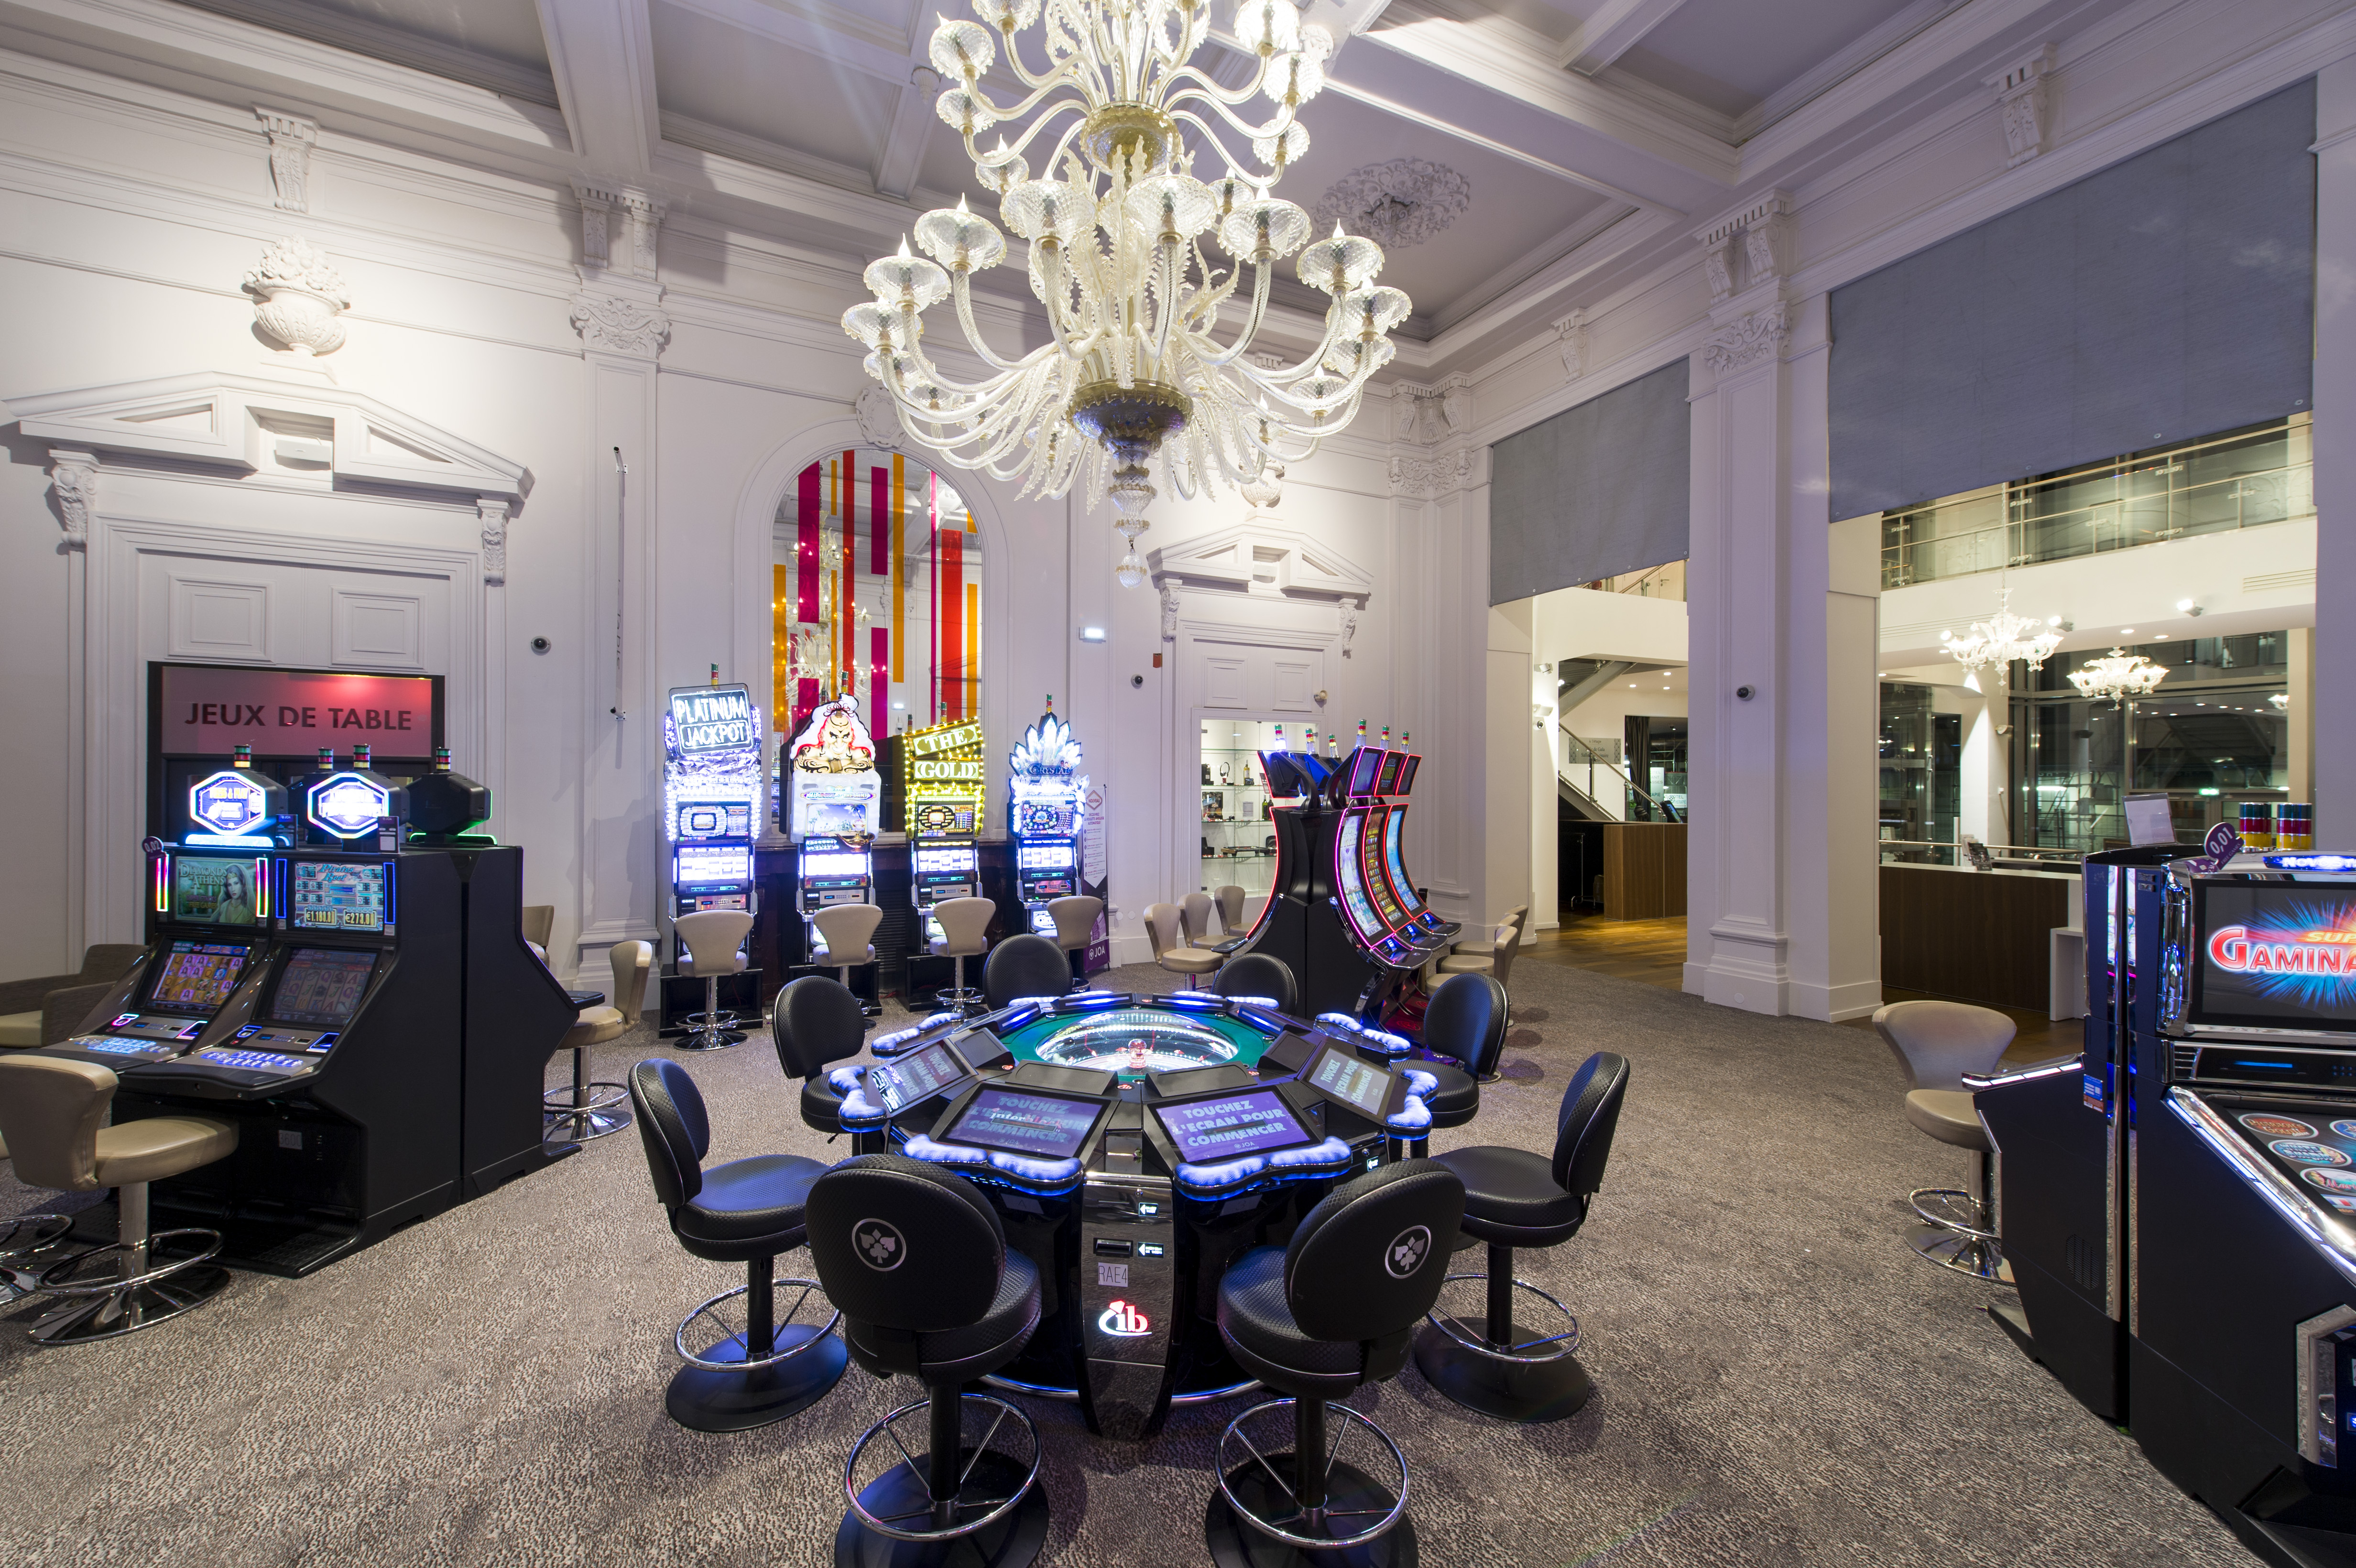 Casino uriage roulette blackjack uk strategy